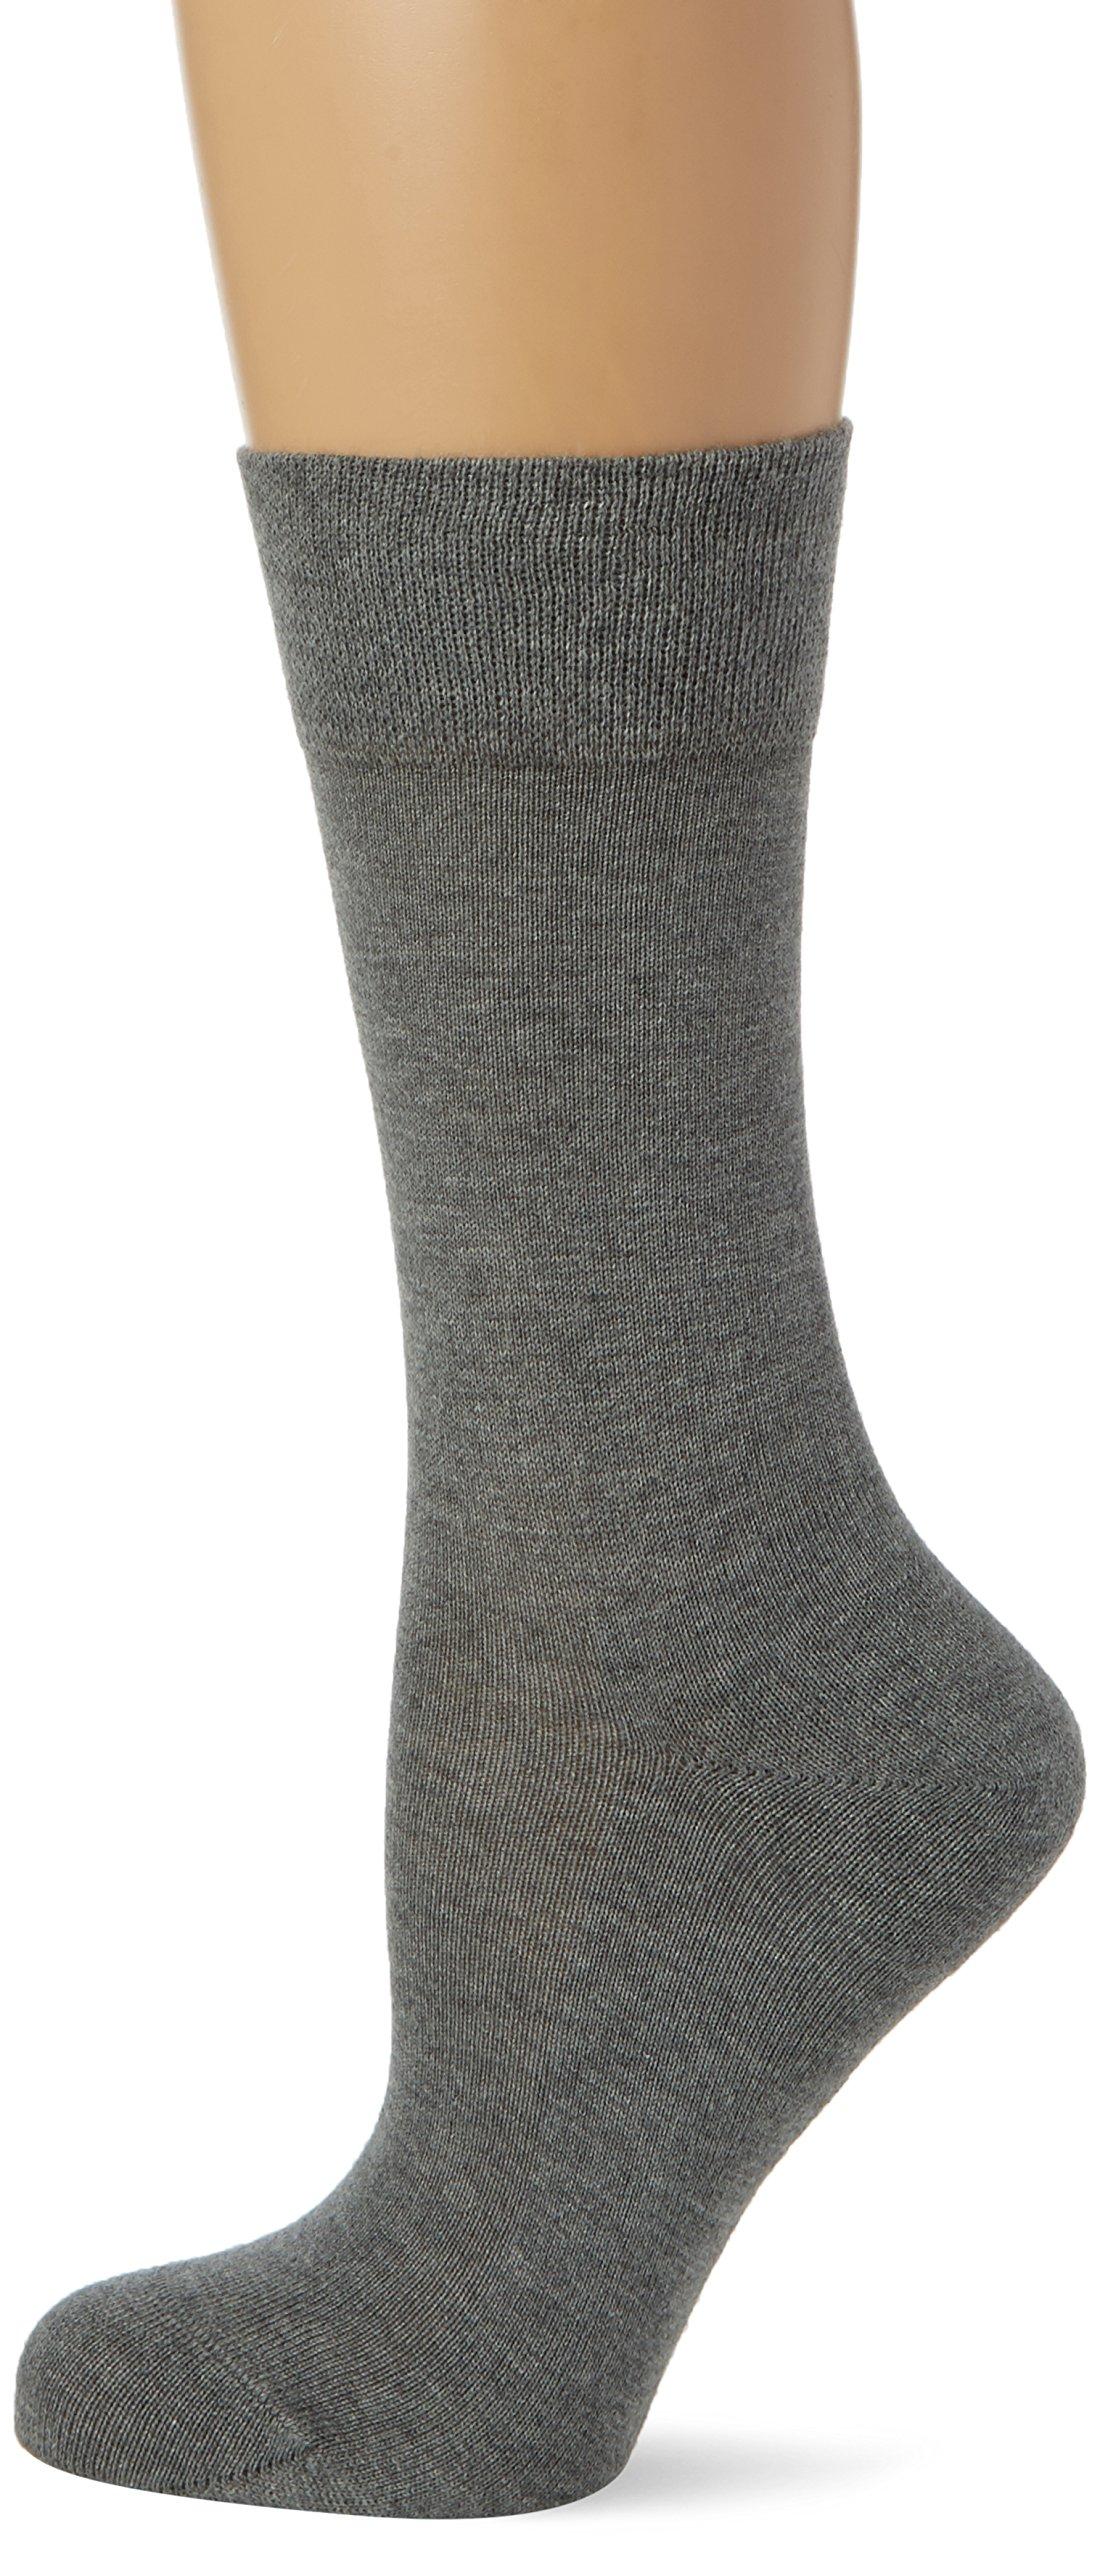 Falke Low Pressure Top Sock (47686) M/L/Light Grey